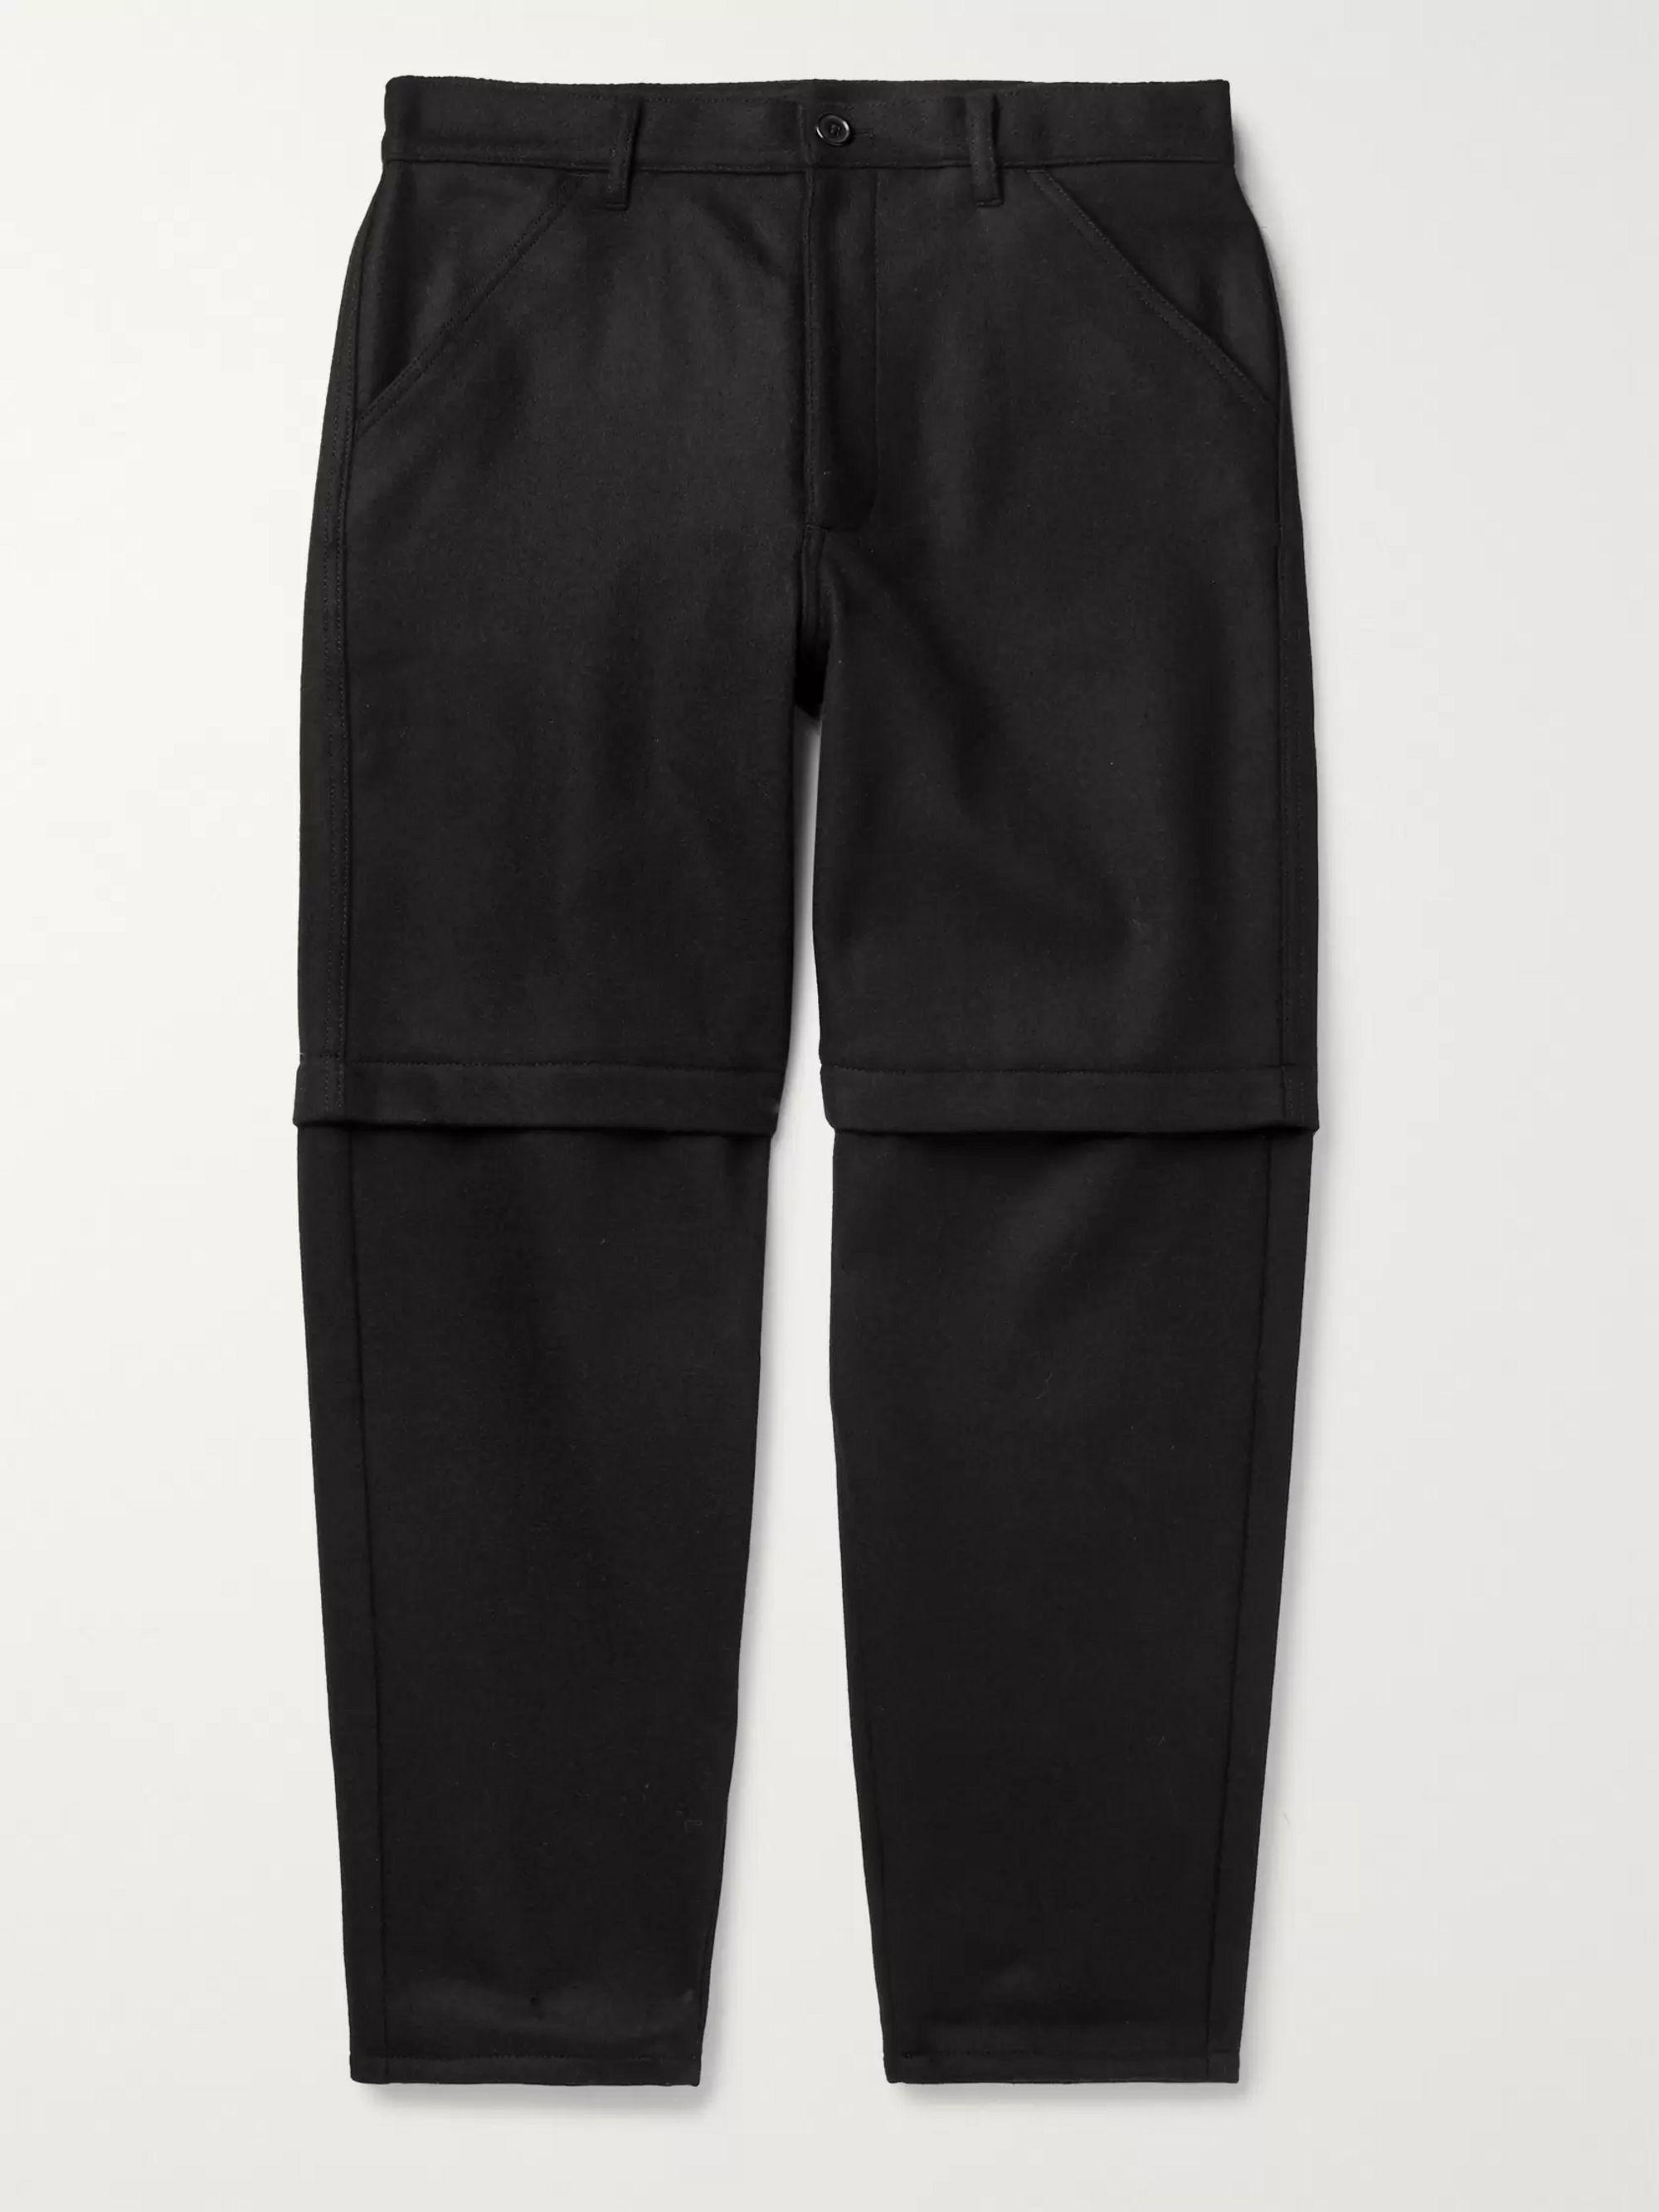 Black Wool Trousers by Comme Des Garçons Shirt